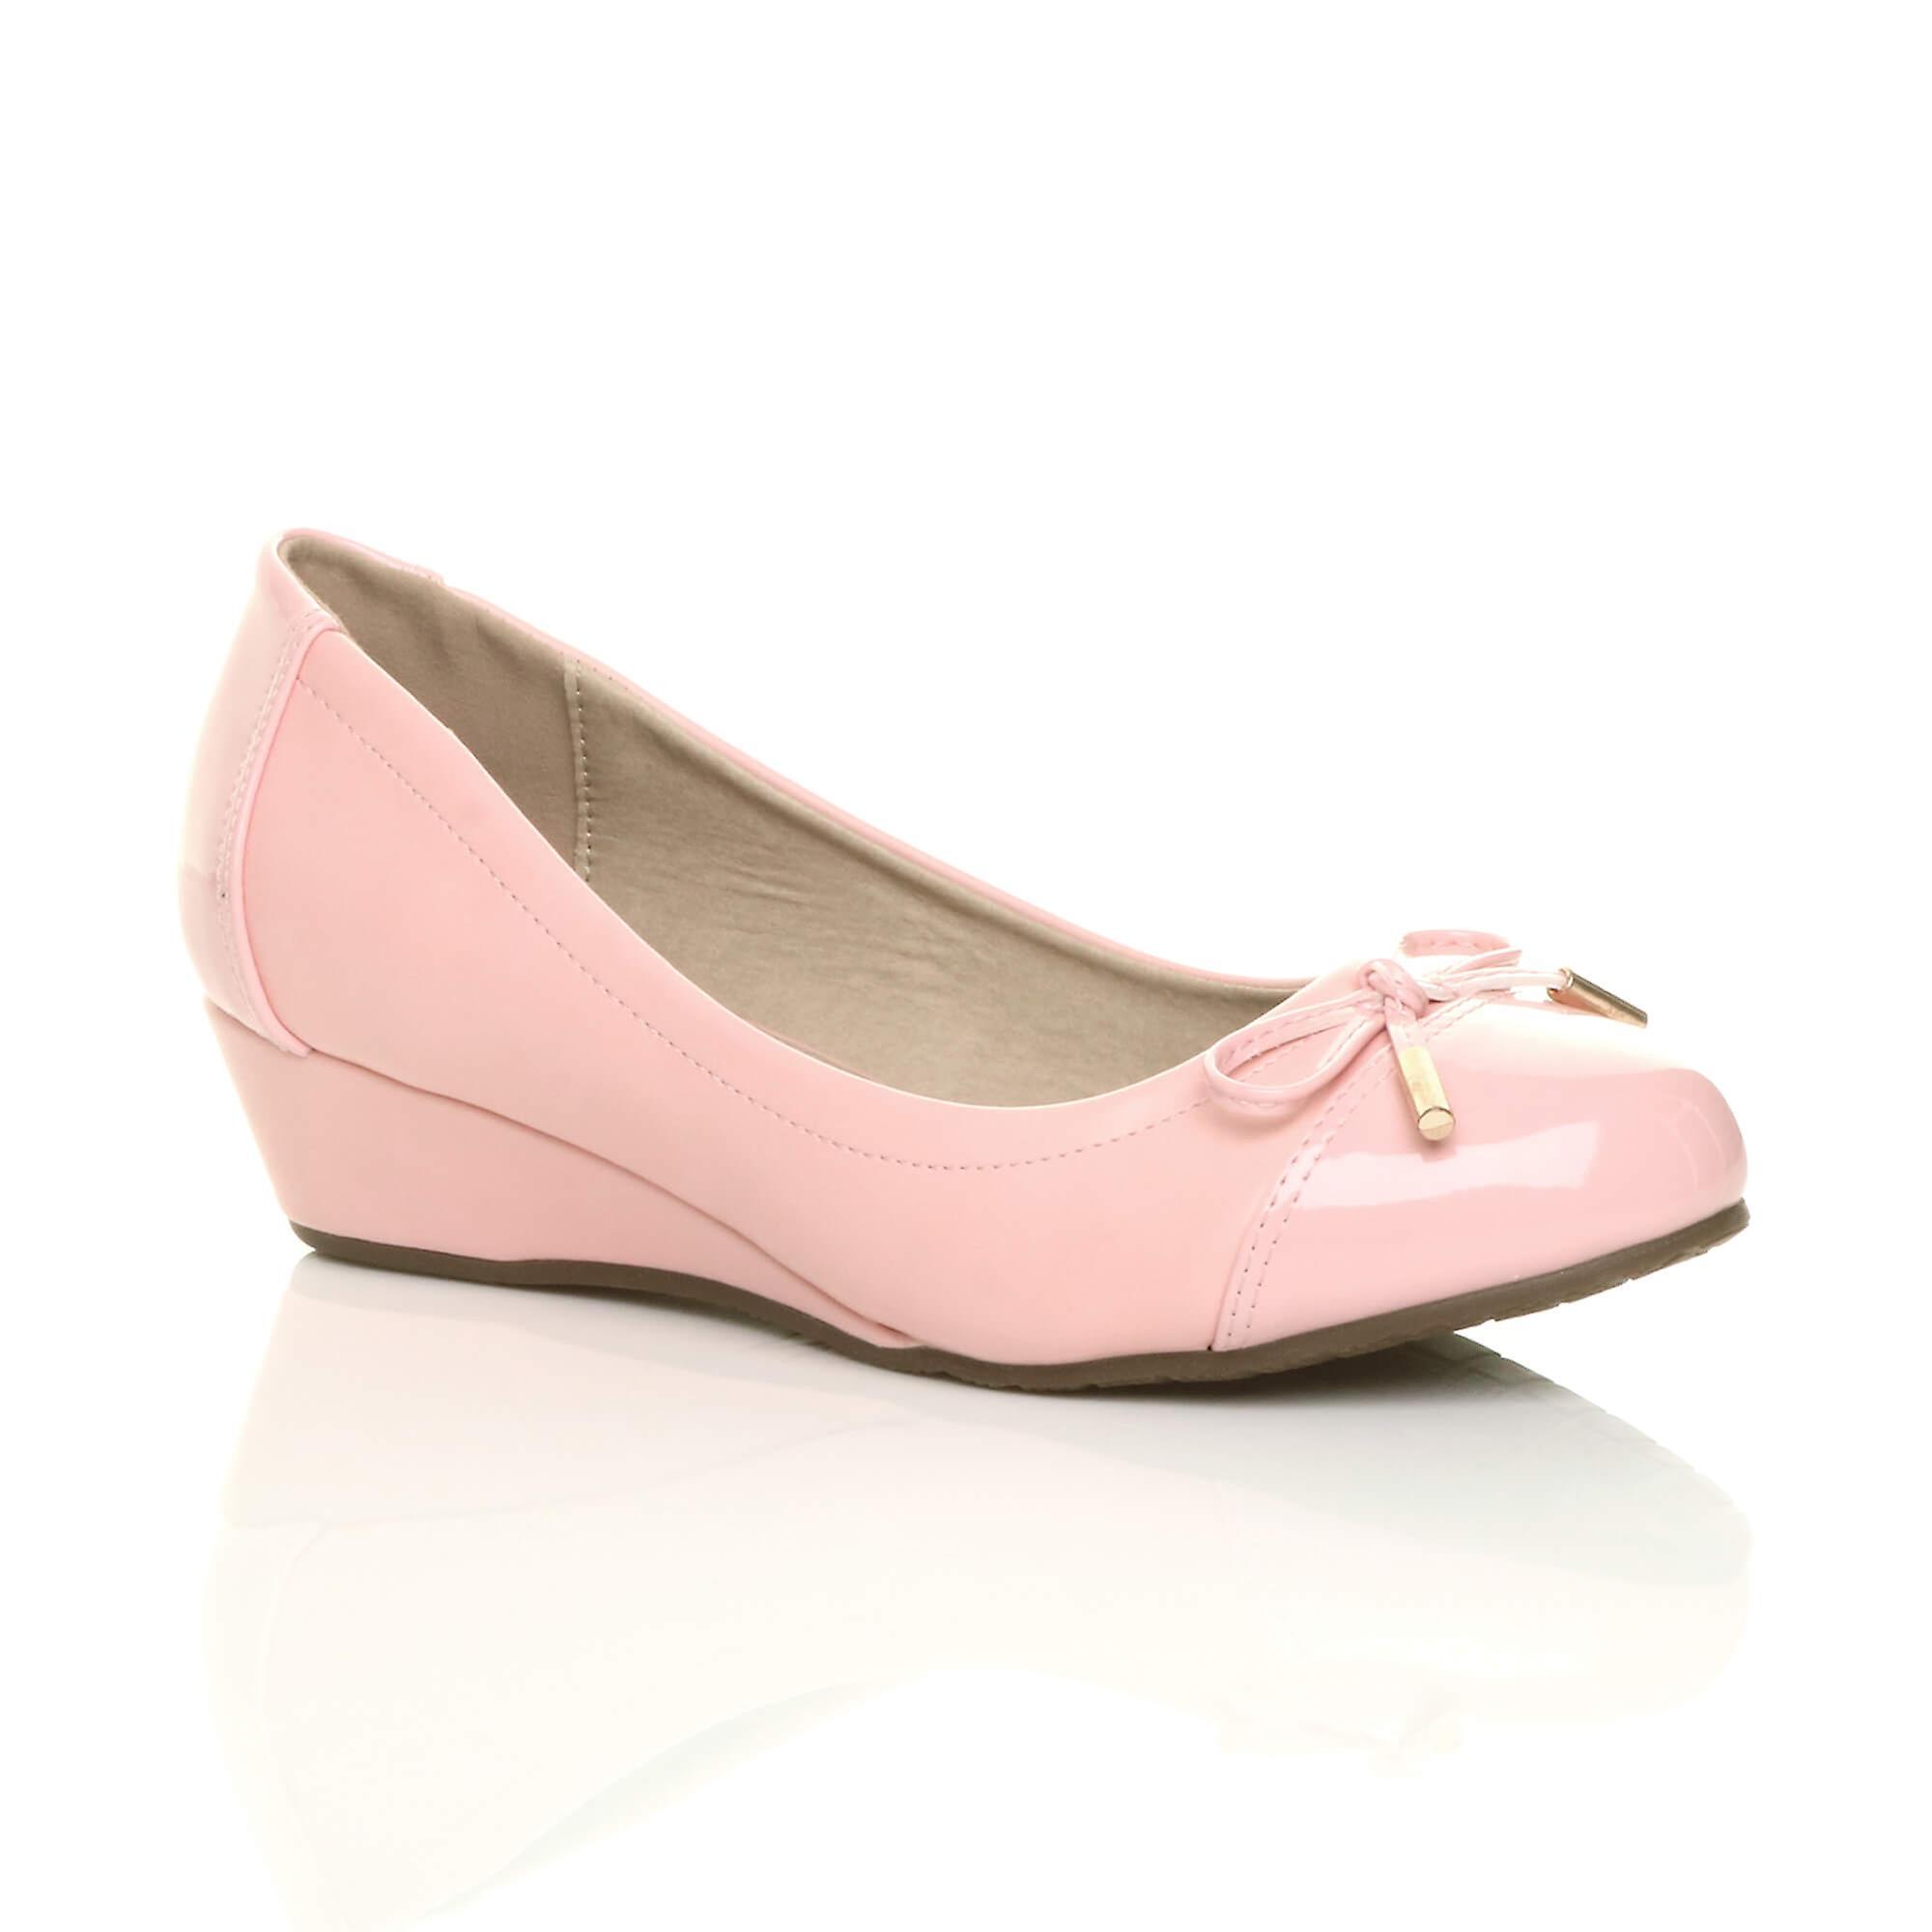 Ajvani womens dolly low mid heel wedge bow smart work dolly womens ballerina court shoes:Online:Men's/Women's 03b19b